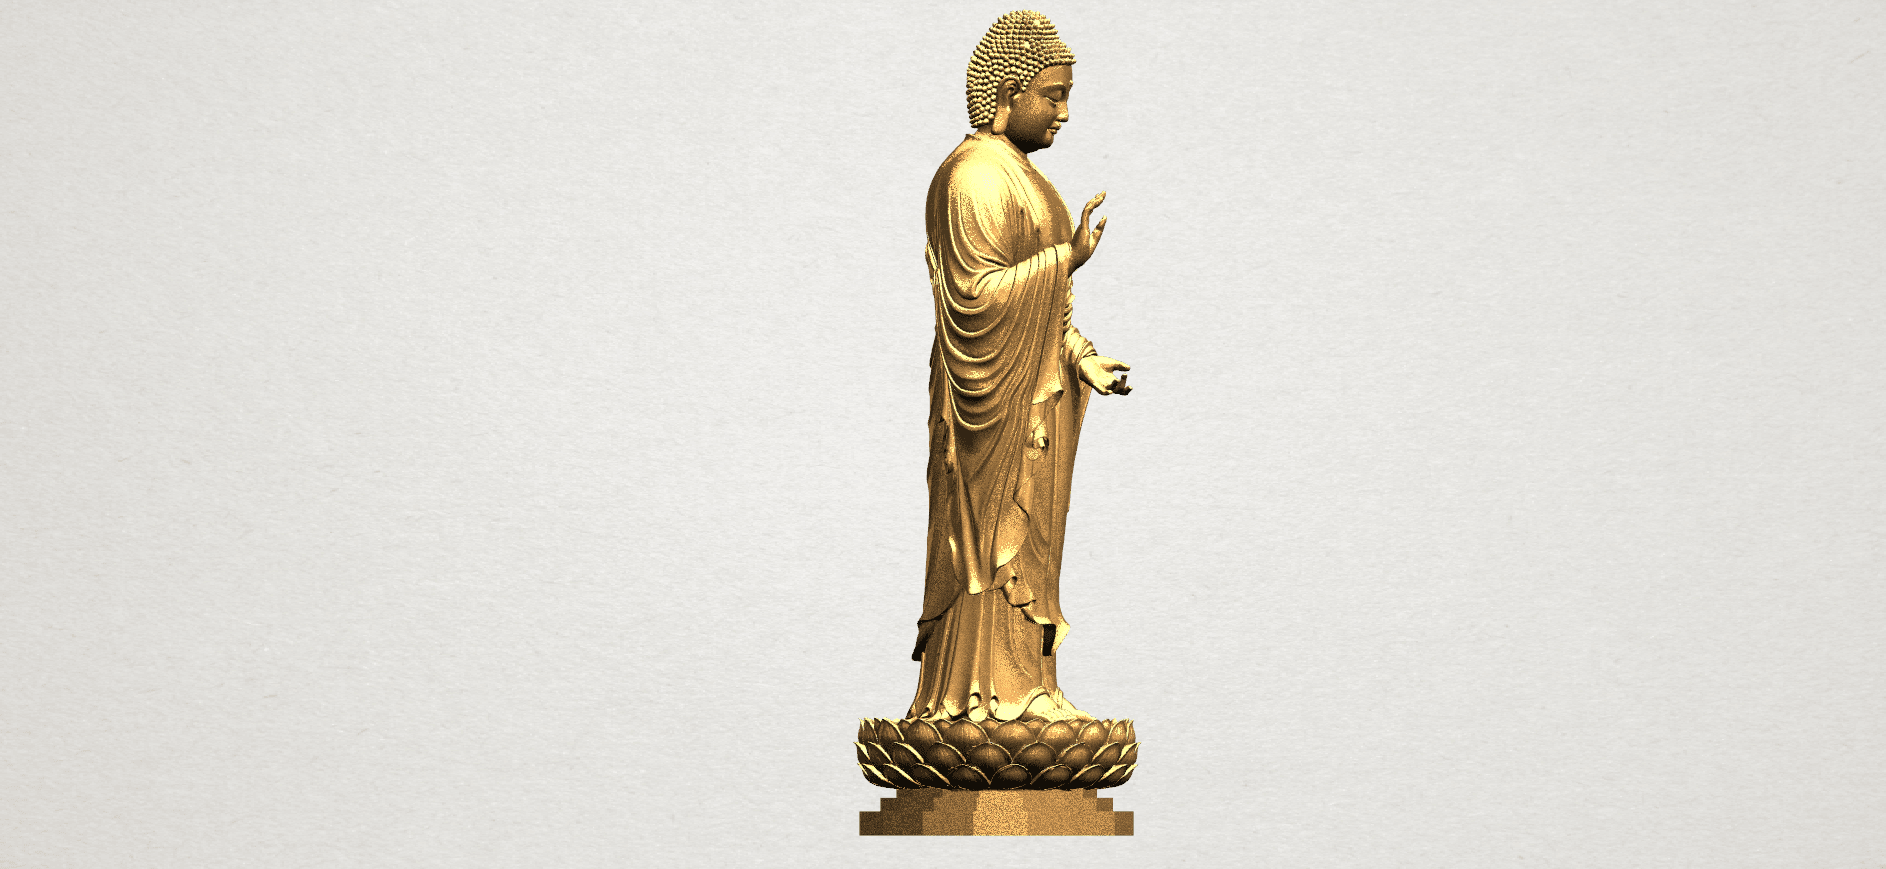 Gautama Buddha Standing (ii) A07.png Download free STL file Gautama Buddha Standing 02 • 3D printer design, GeorgesNikkei